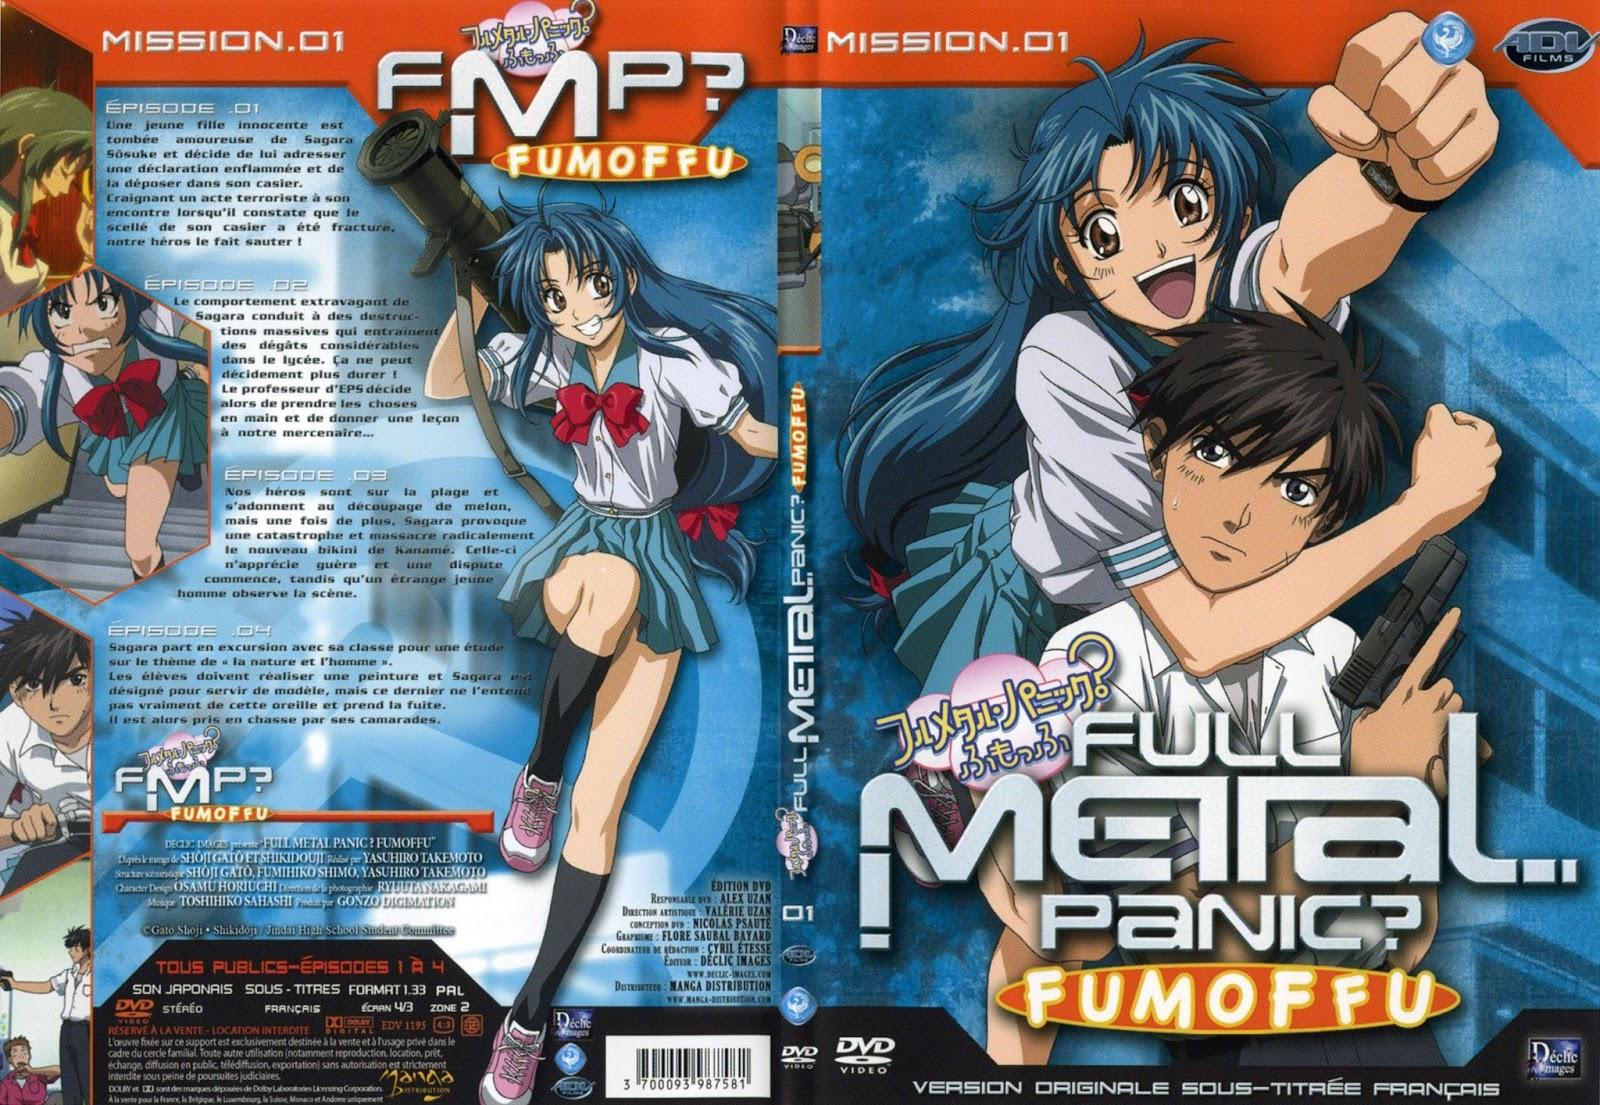 lista de episodios de full metal panic fumofu: